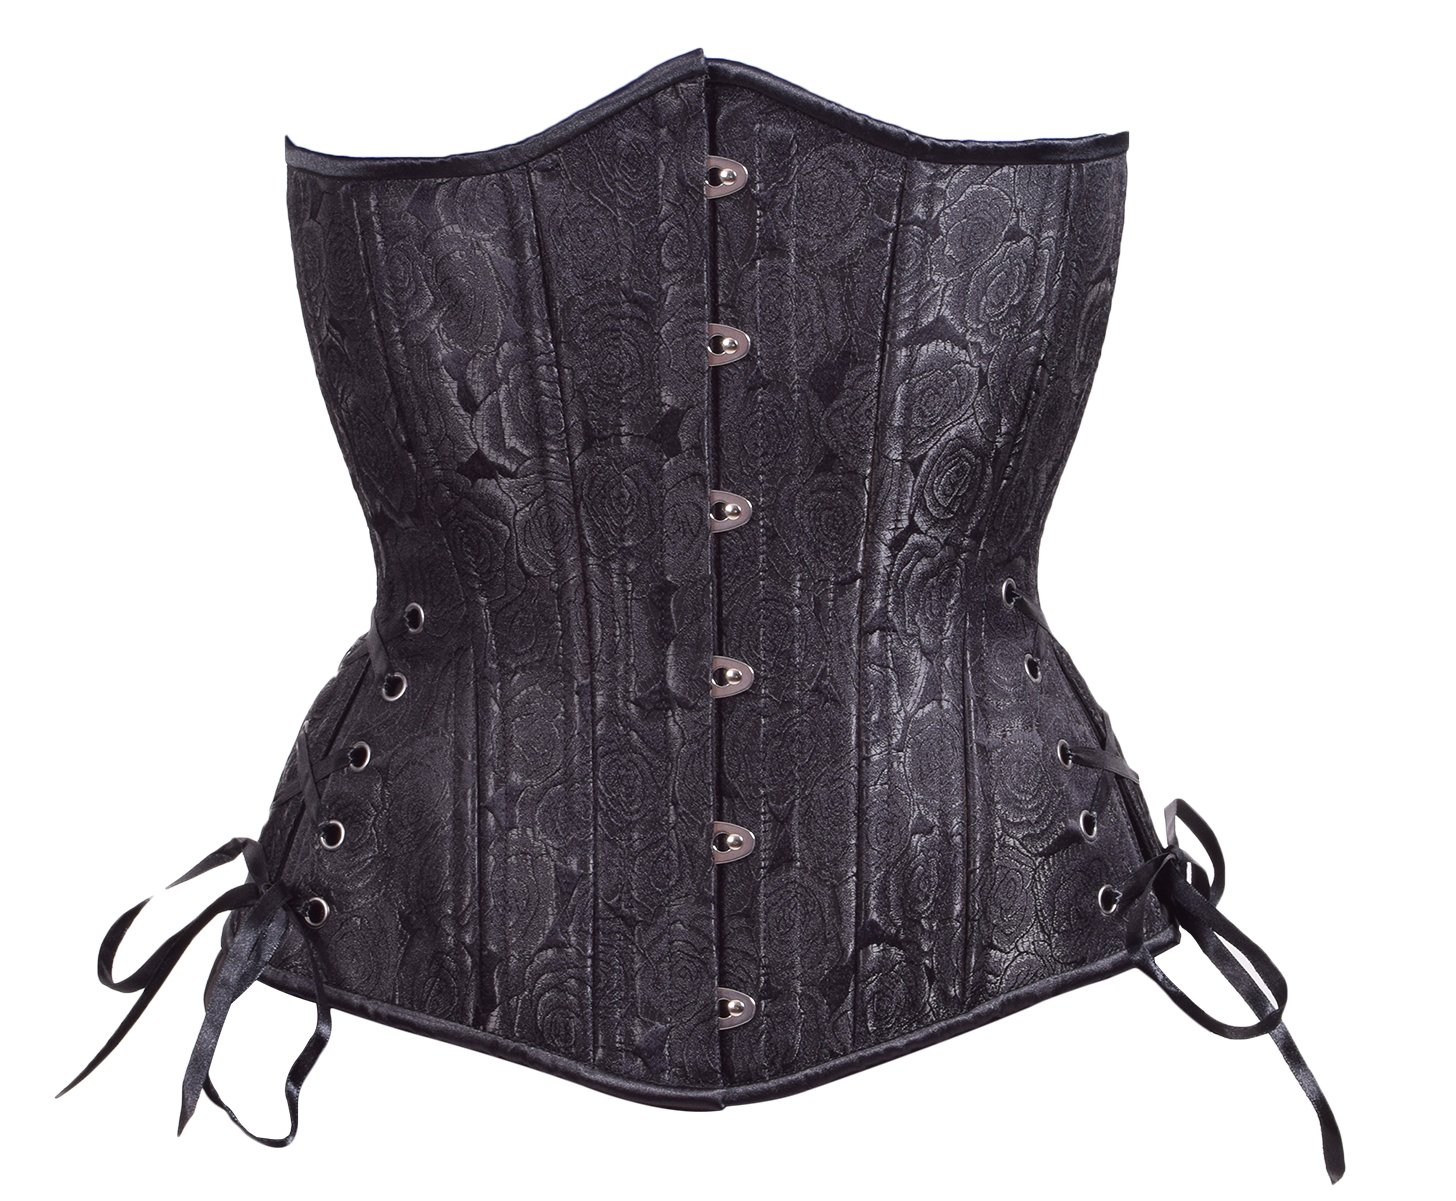 Timeless Trends Womens Steel Boned Waist Training Floral Long Corset 22 Black